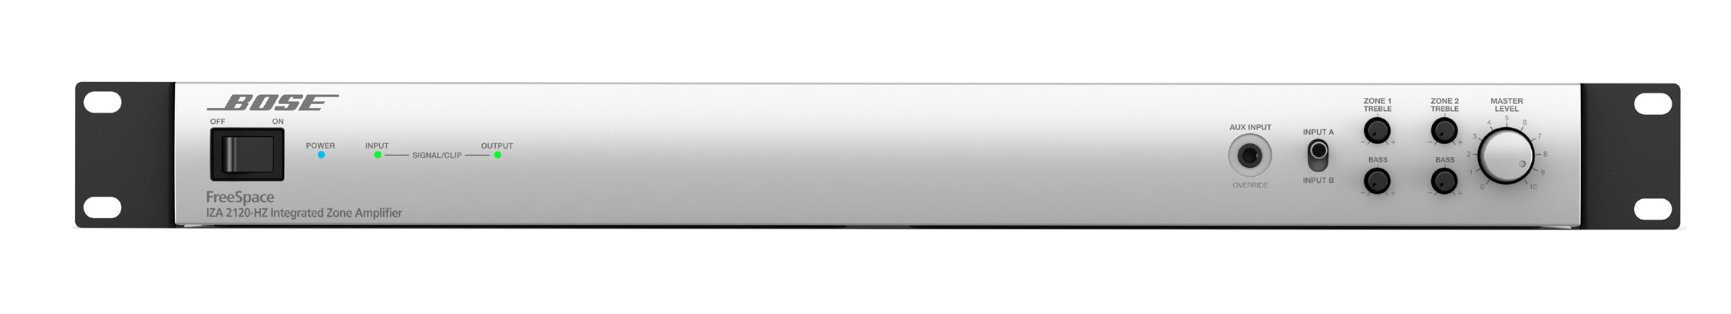 2x120W Freespace Mixer Amplifier